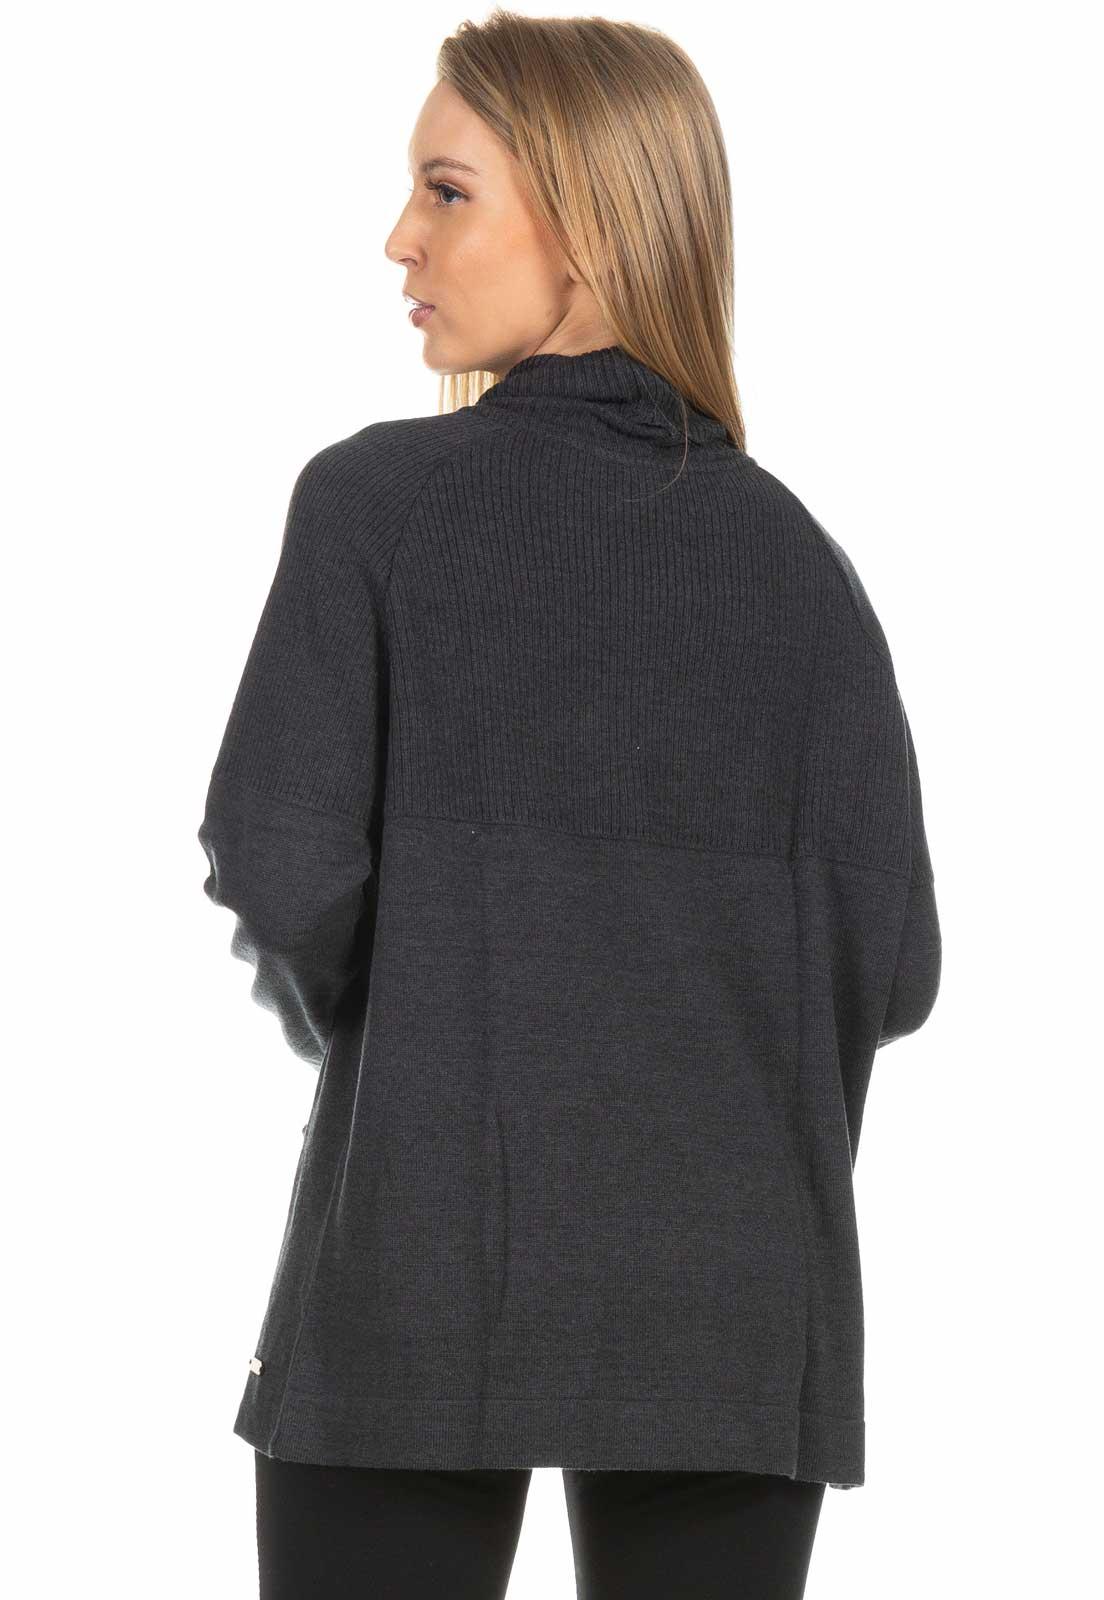 Blusa Dioxes Manga Longa com Bolso de Tricot